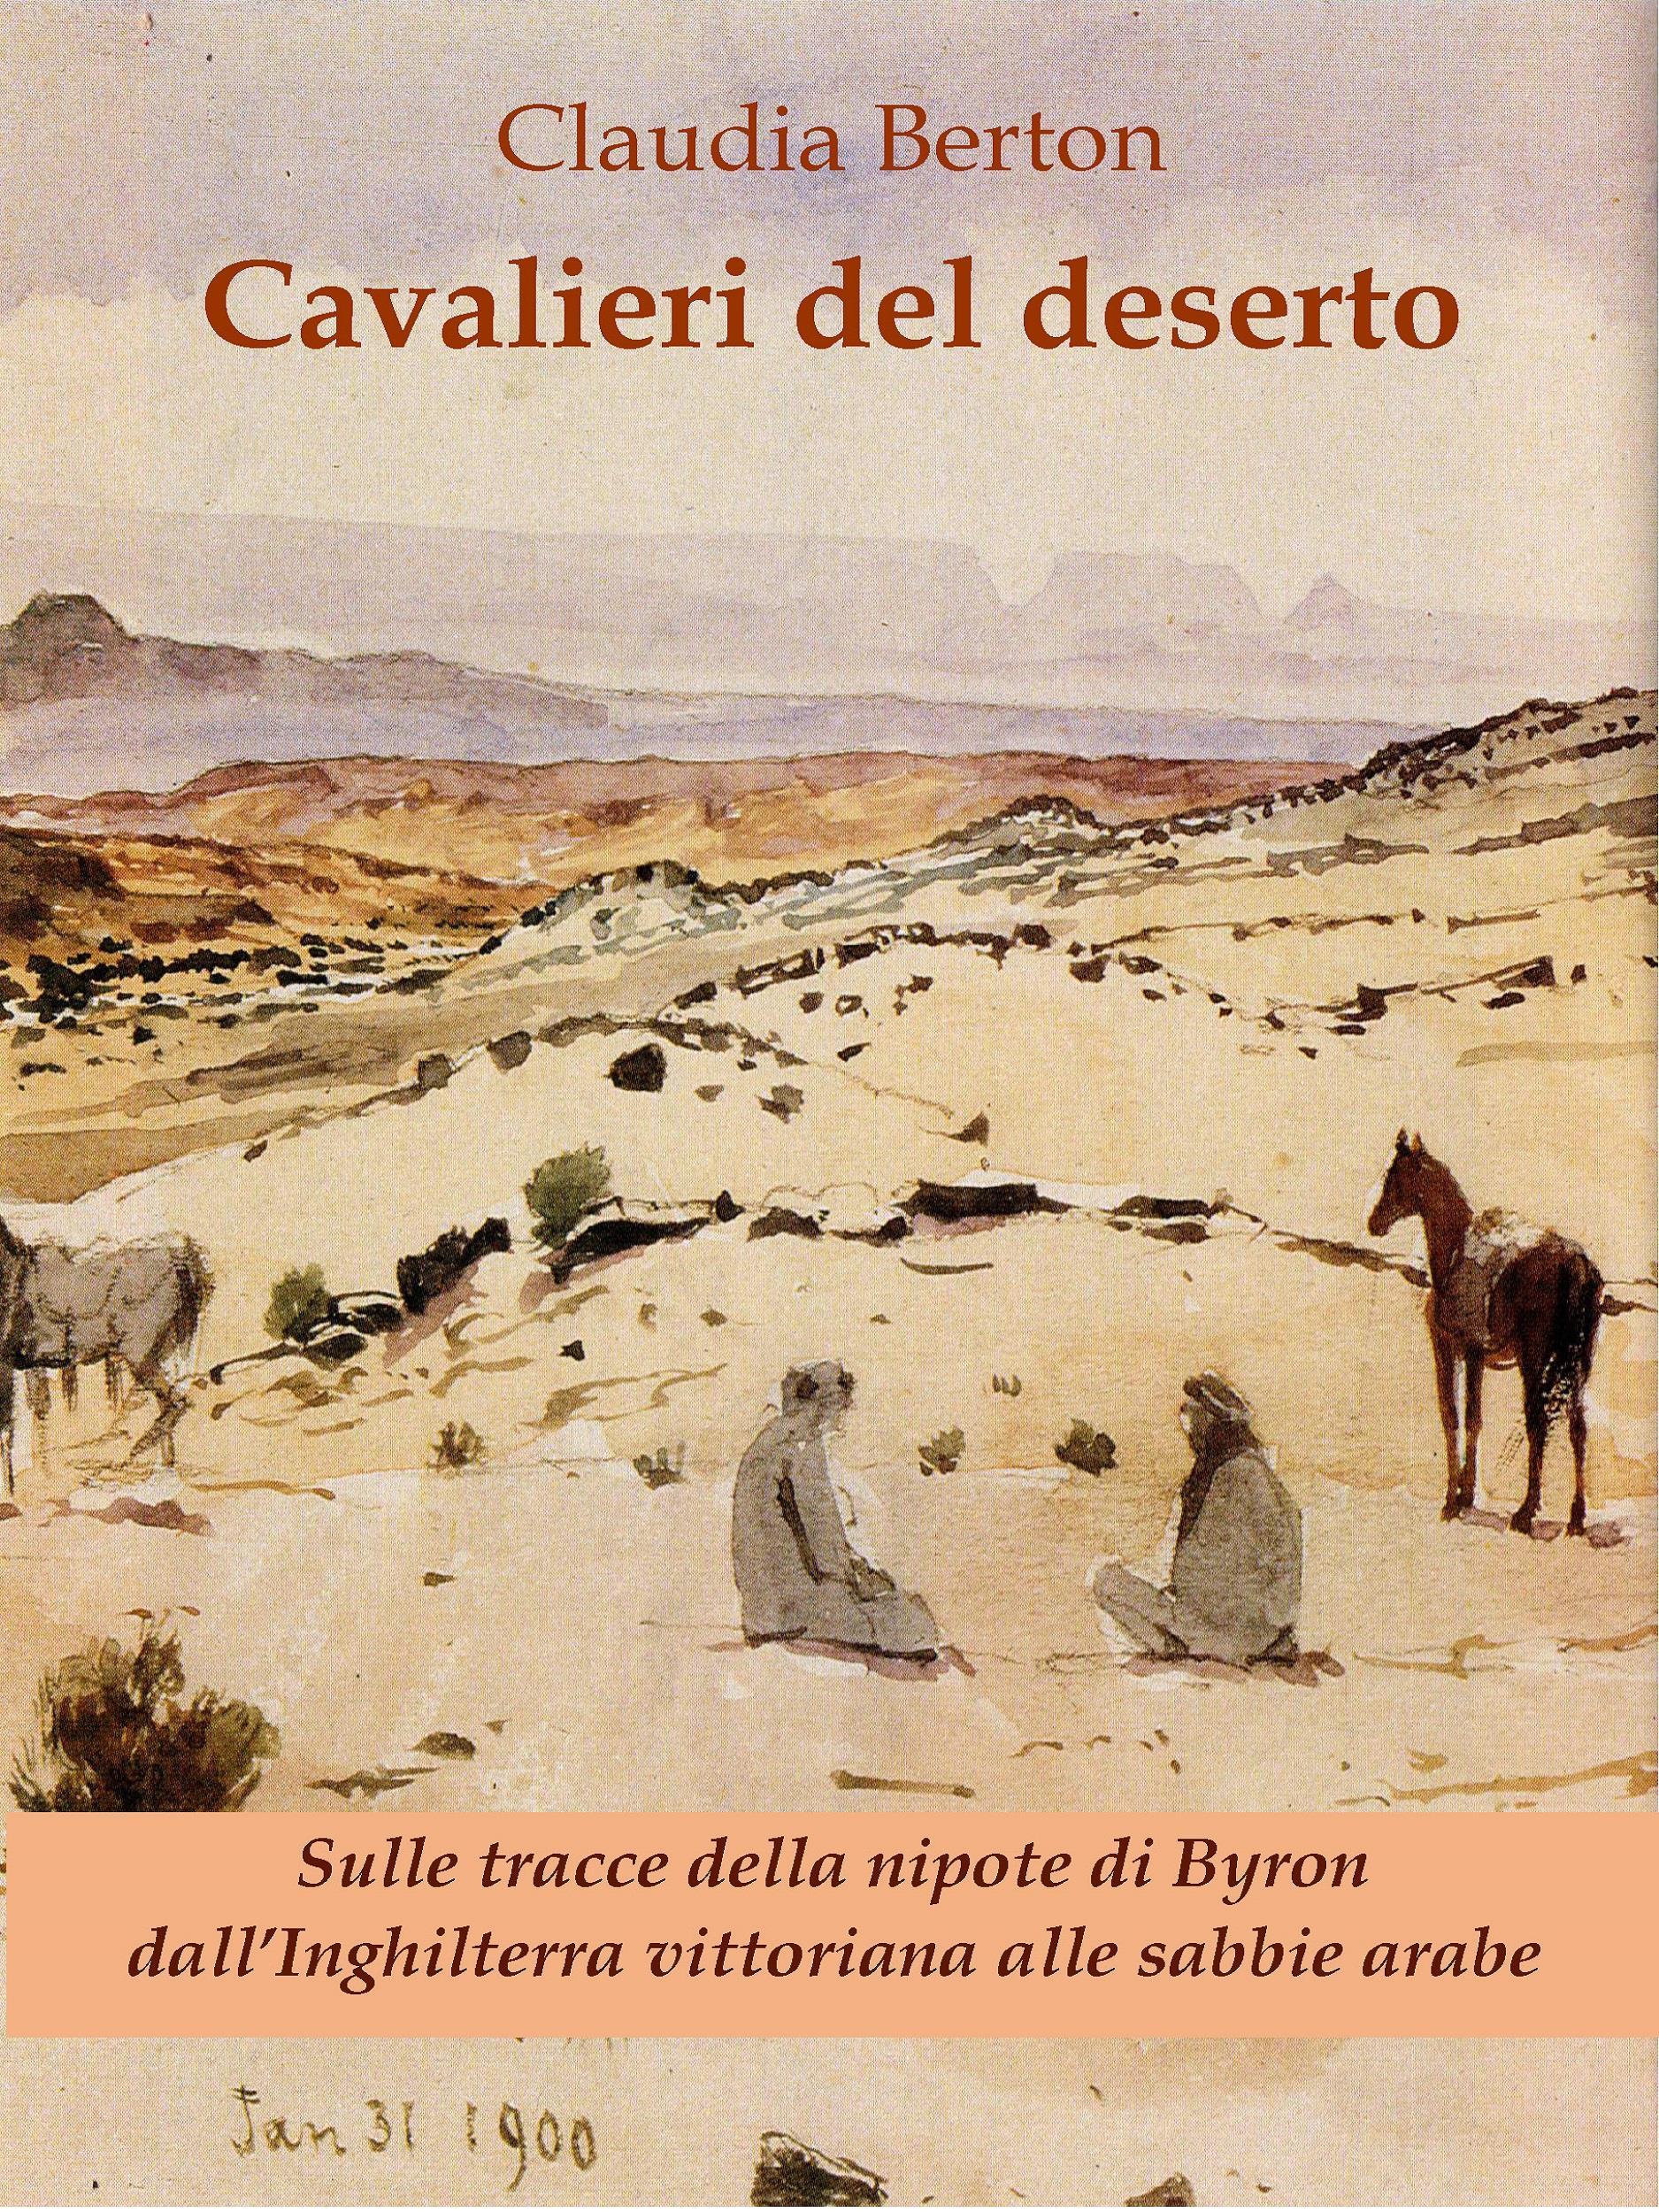 Cavalieri del deserto